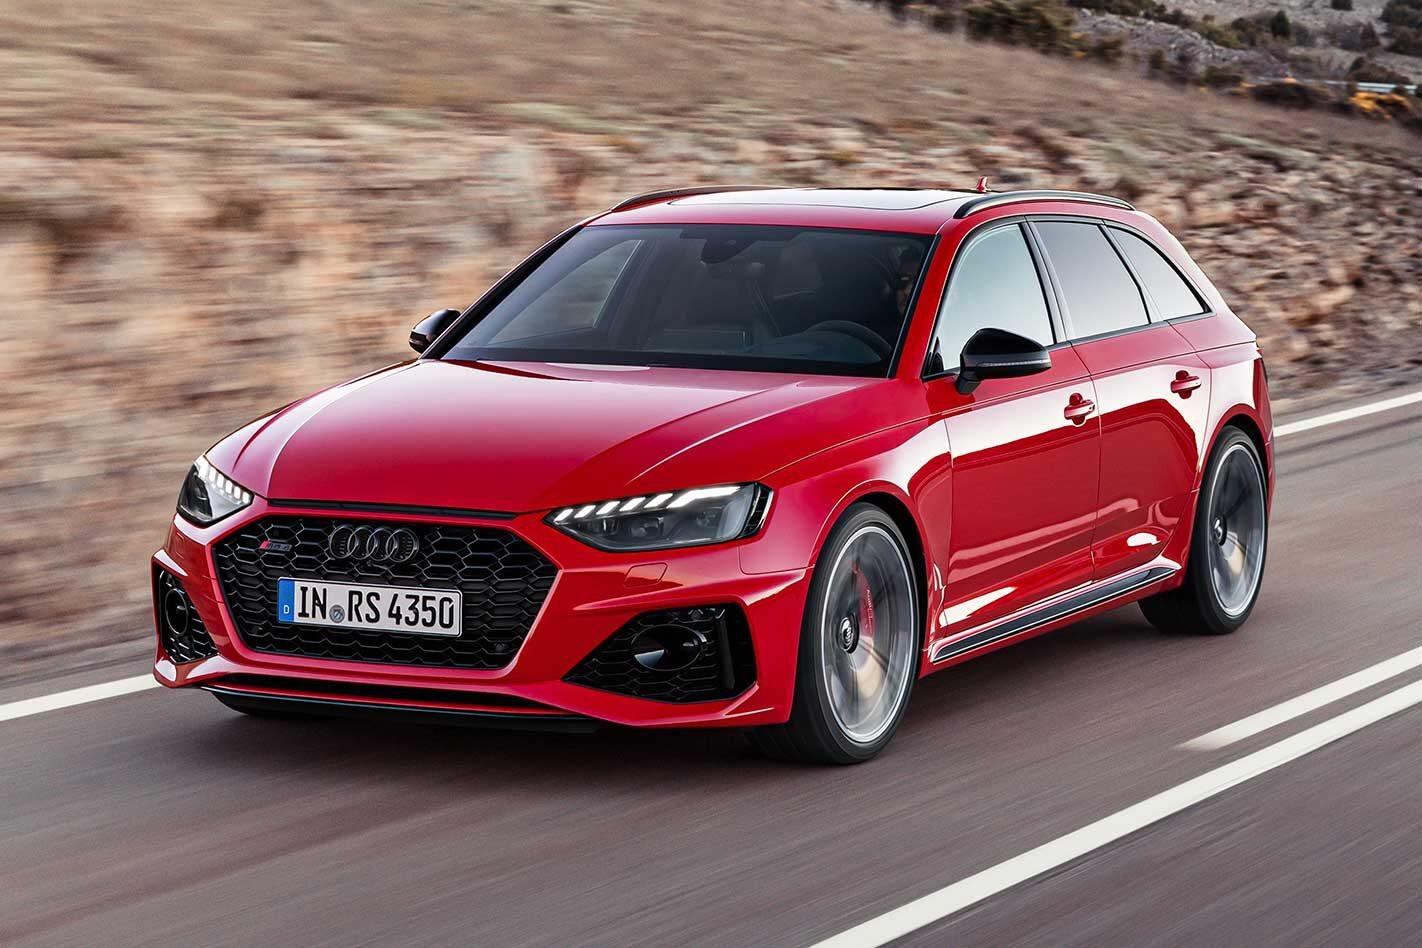 2020 Audi RS4 Avant revealed